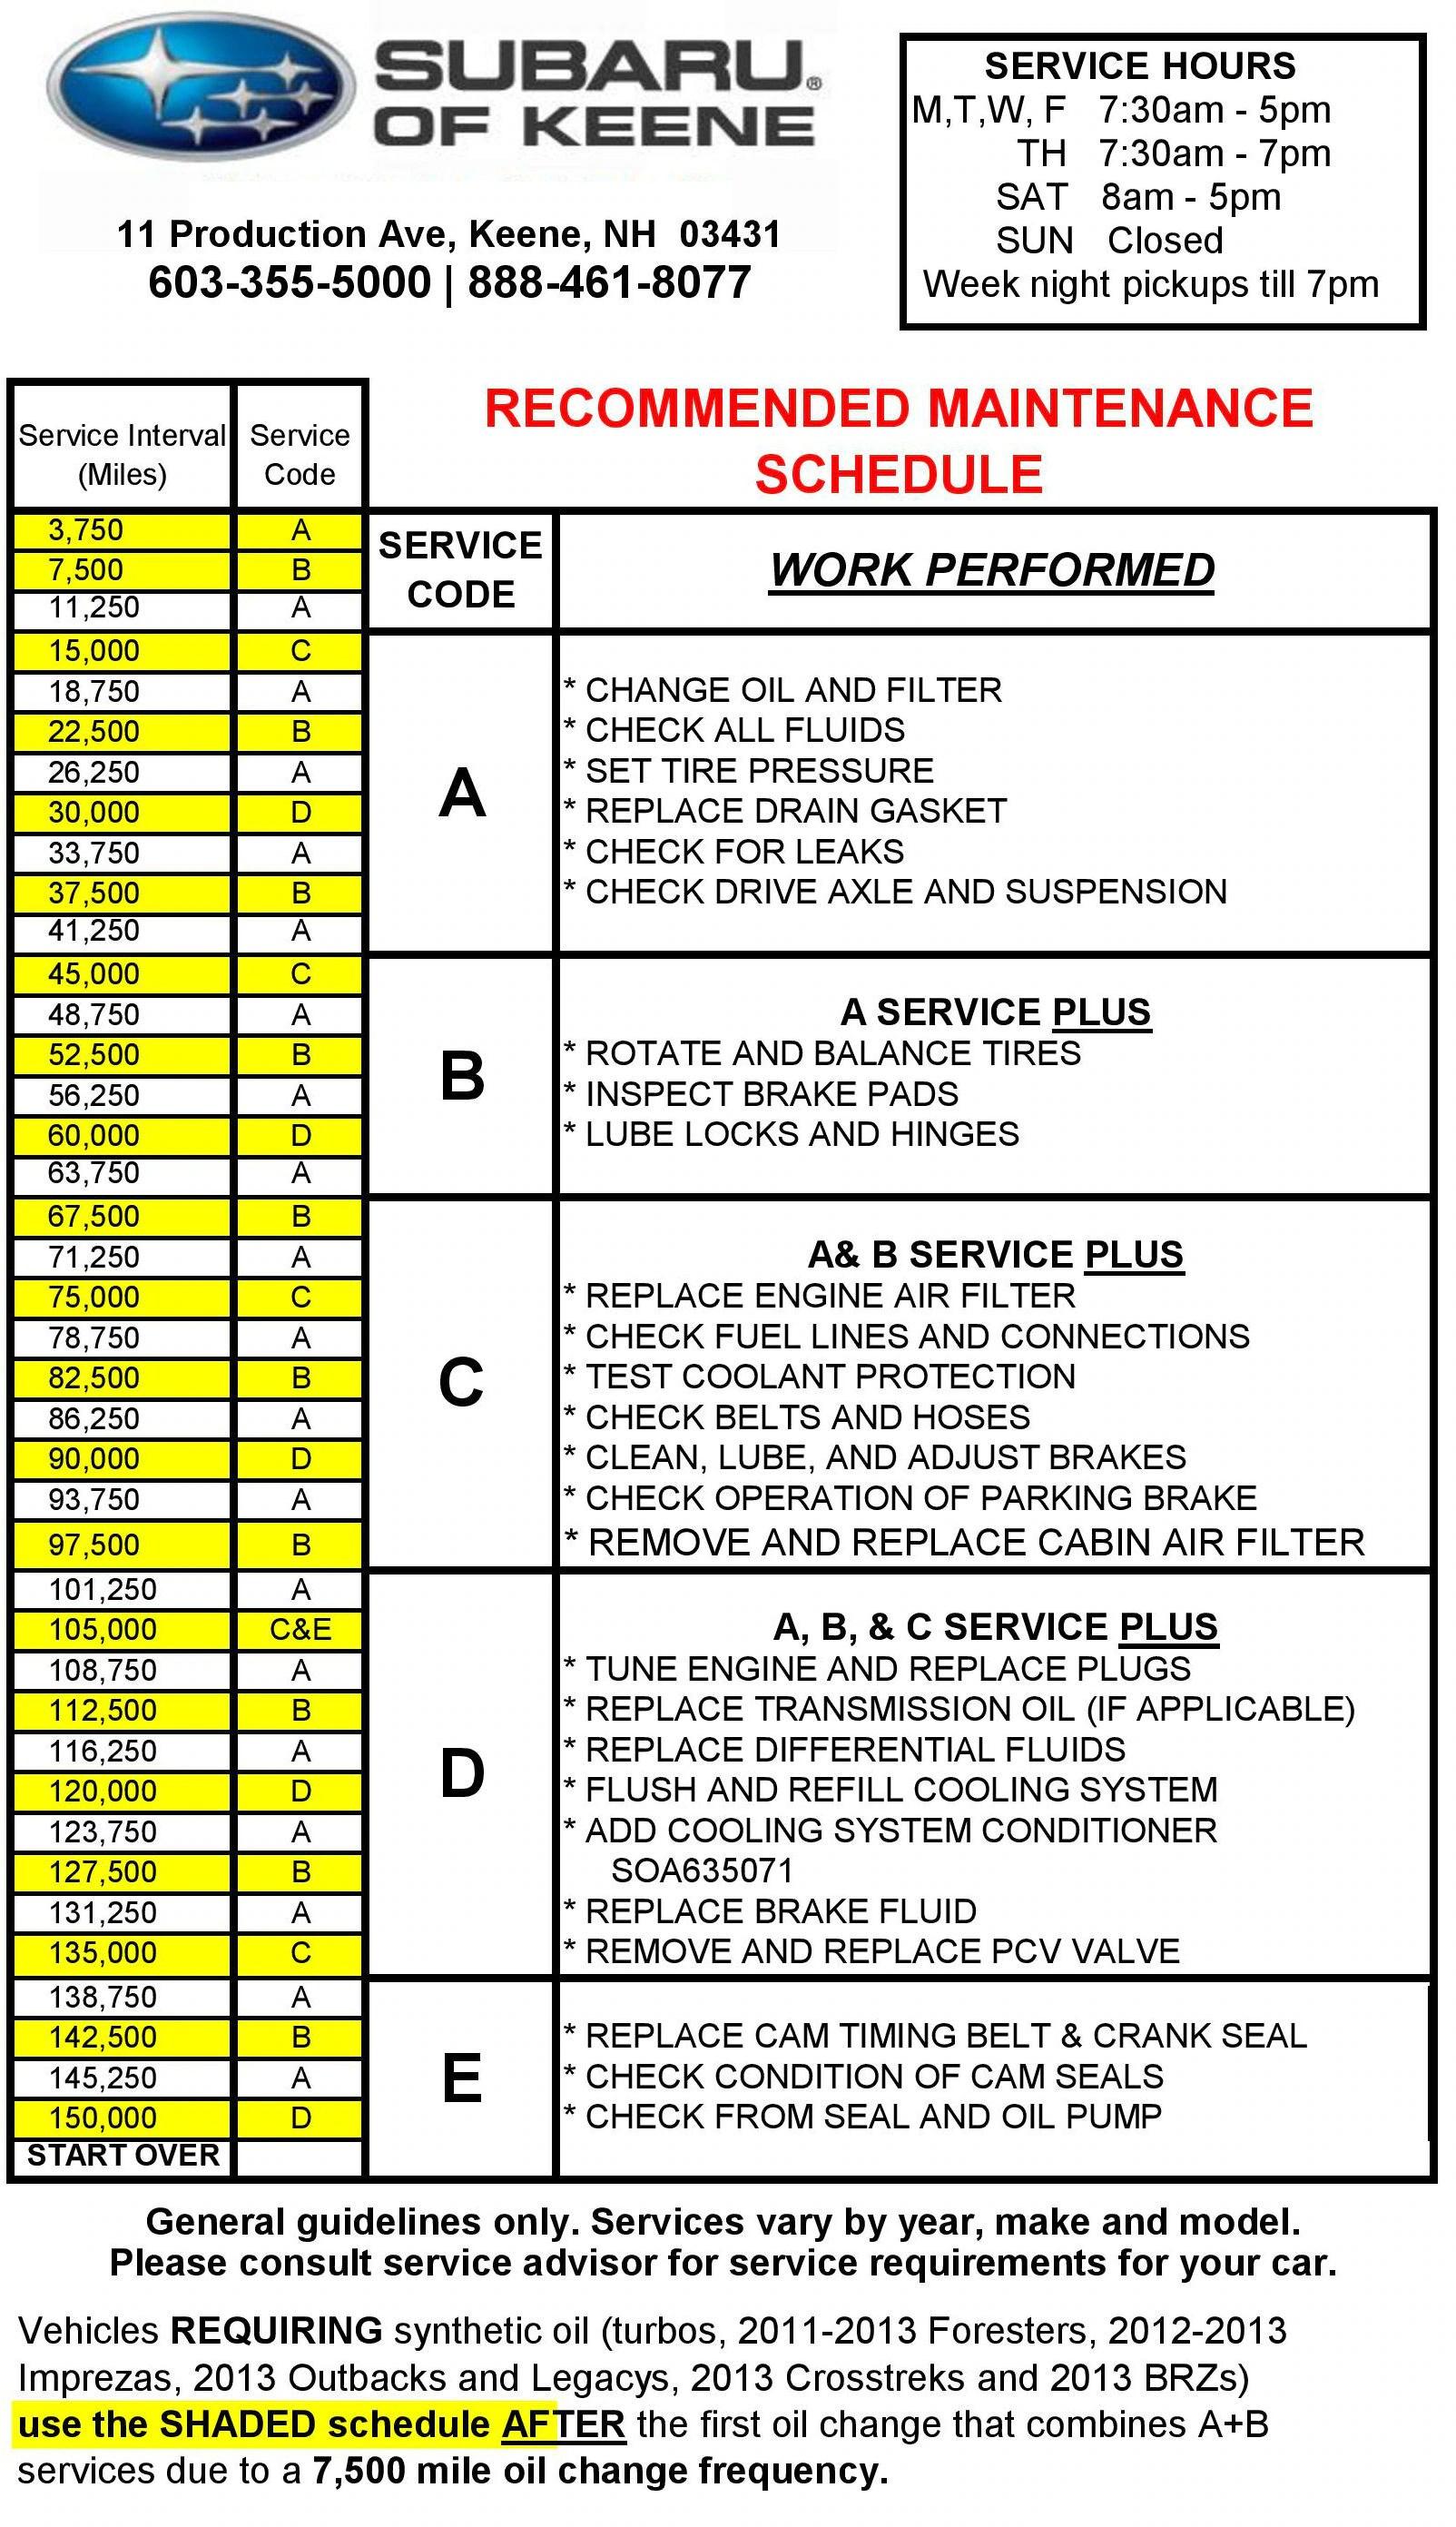 2018 Subaru Maintenance Schedule Interesting Maintenance 2018